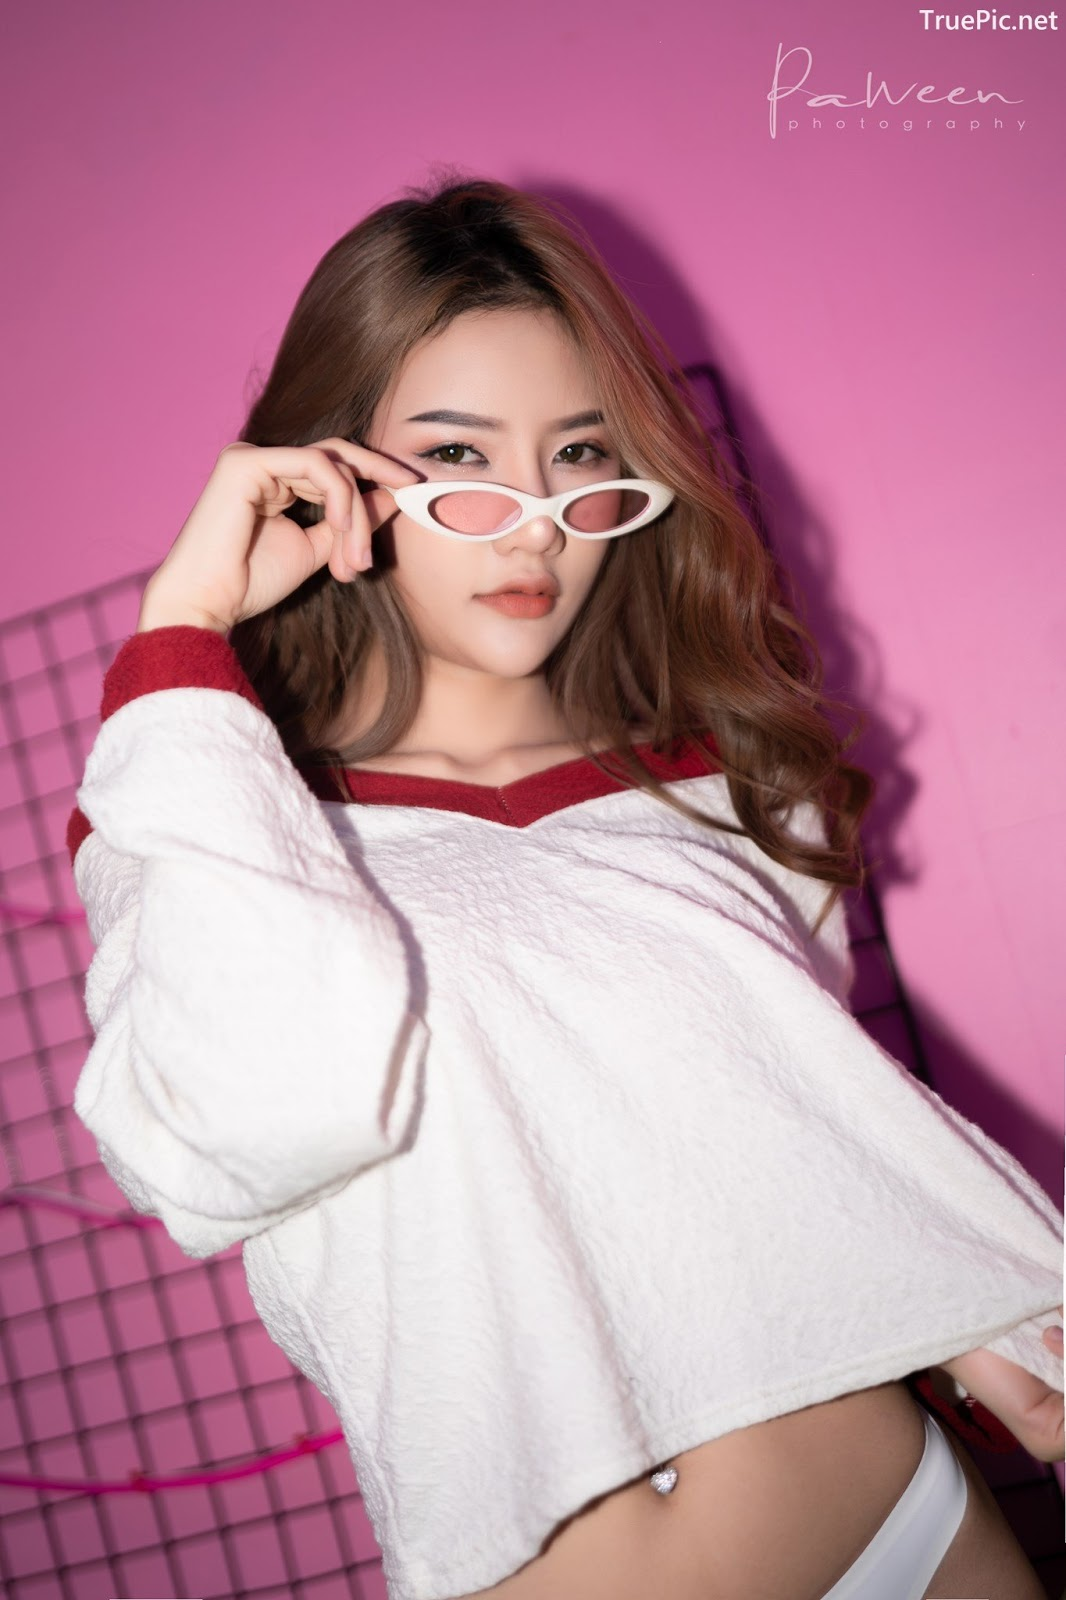 Image Thailand Model - Atittaya Chaiyasing - White Lace Lingerie - TruePic.net - Picture-28